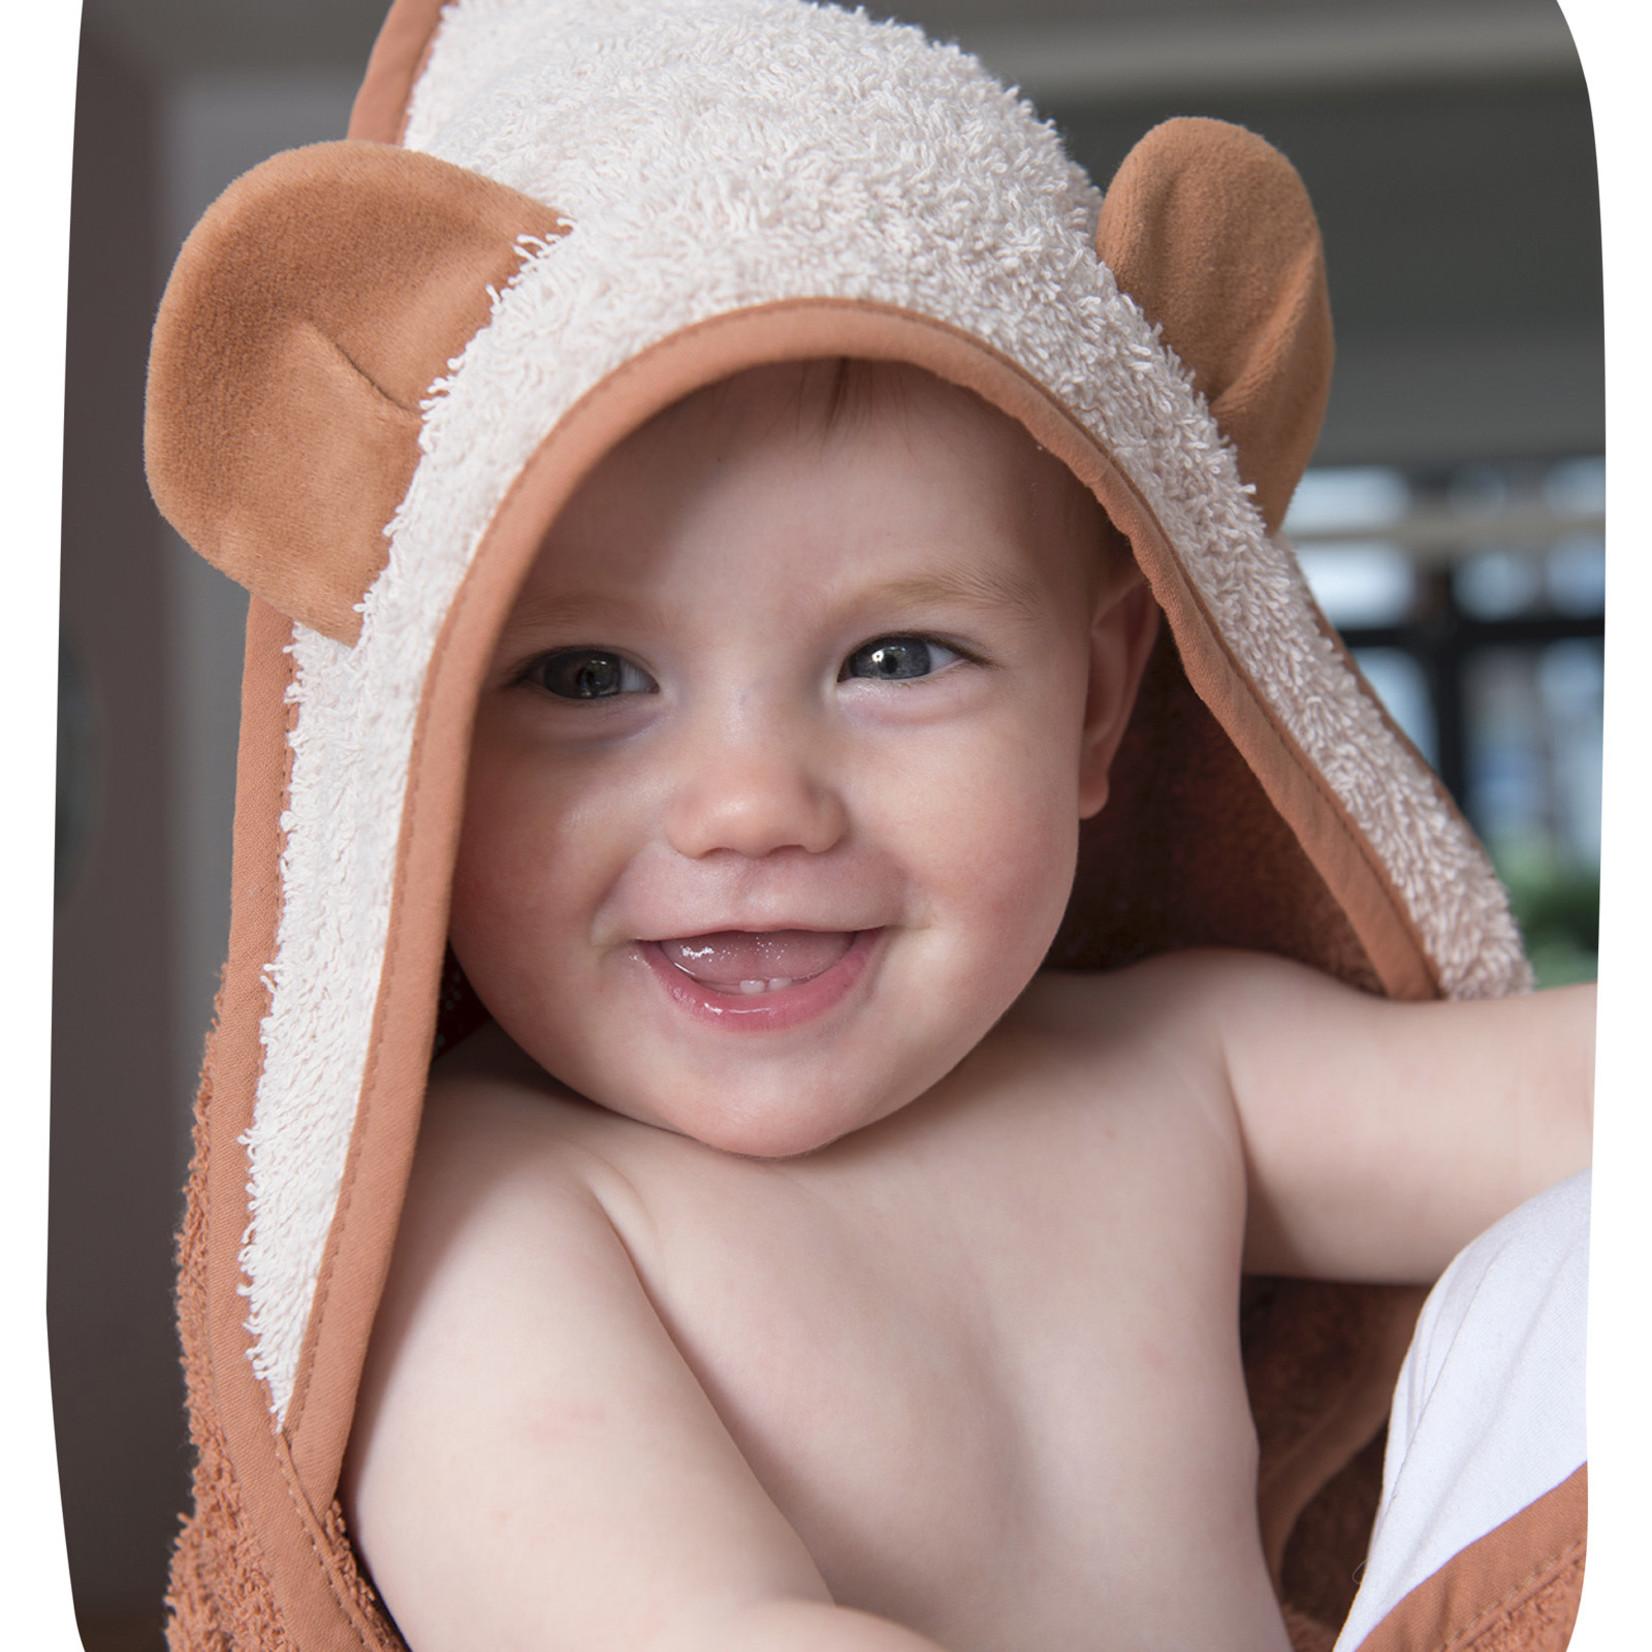 Invented 4 kids Towel Handsfree Monkey